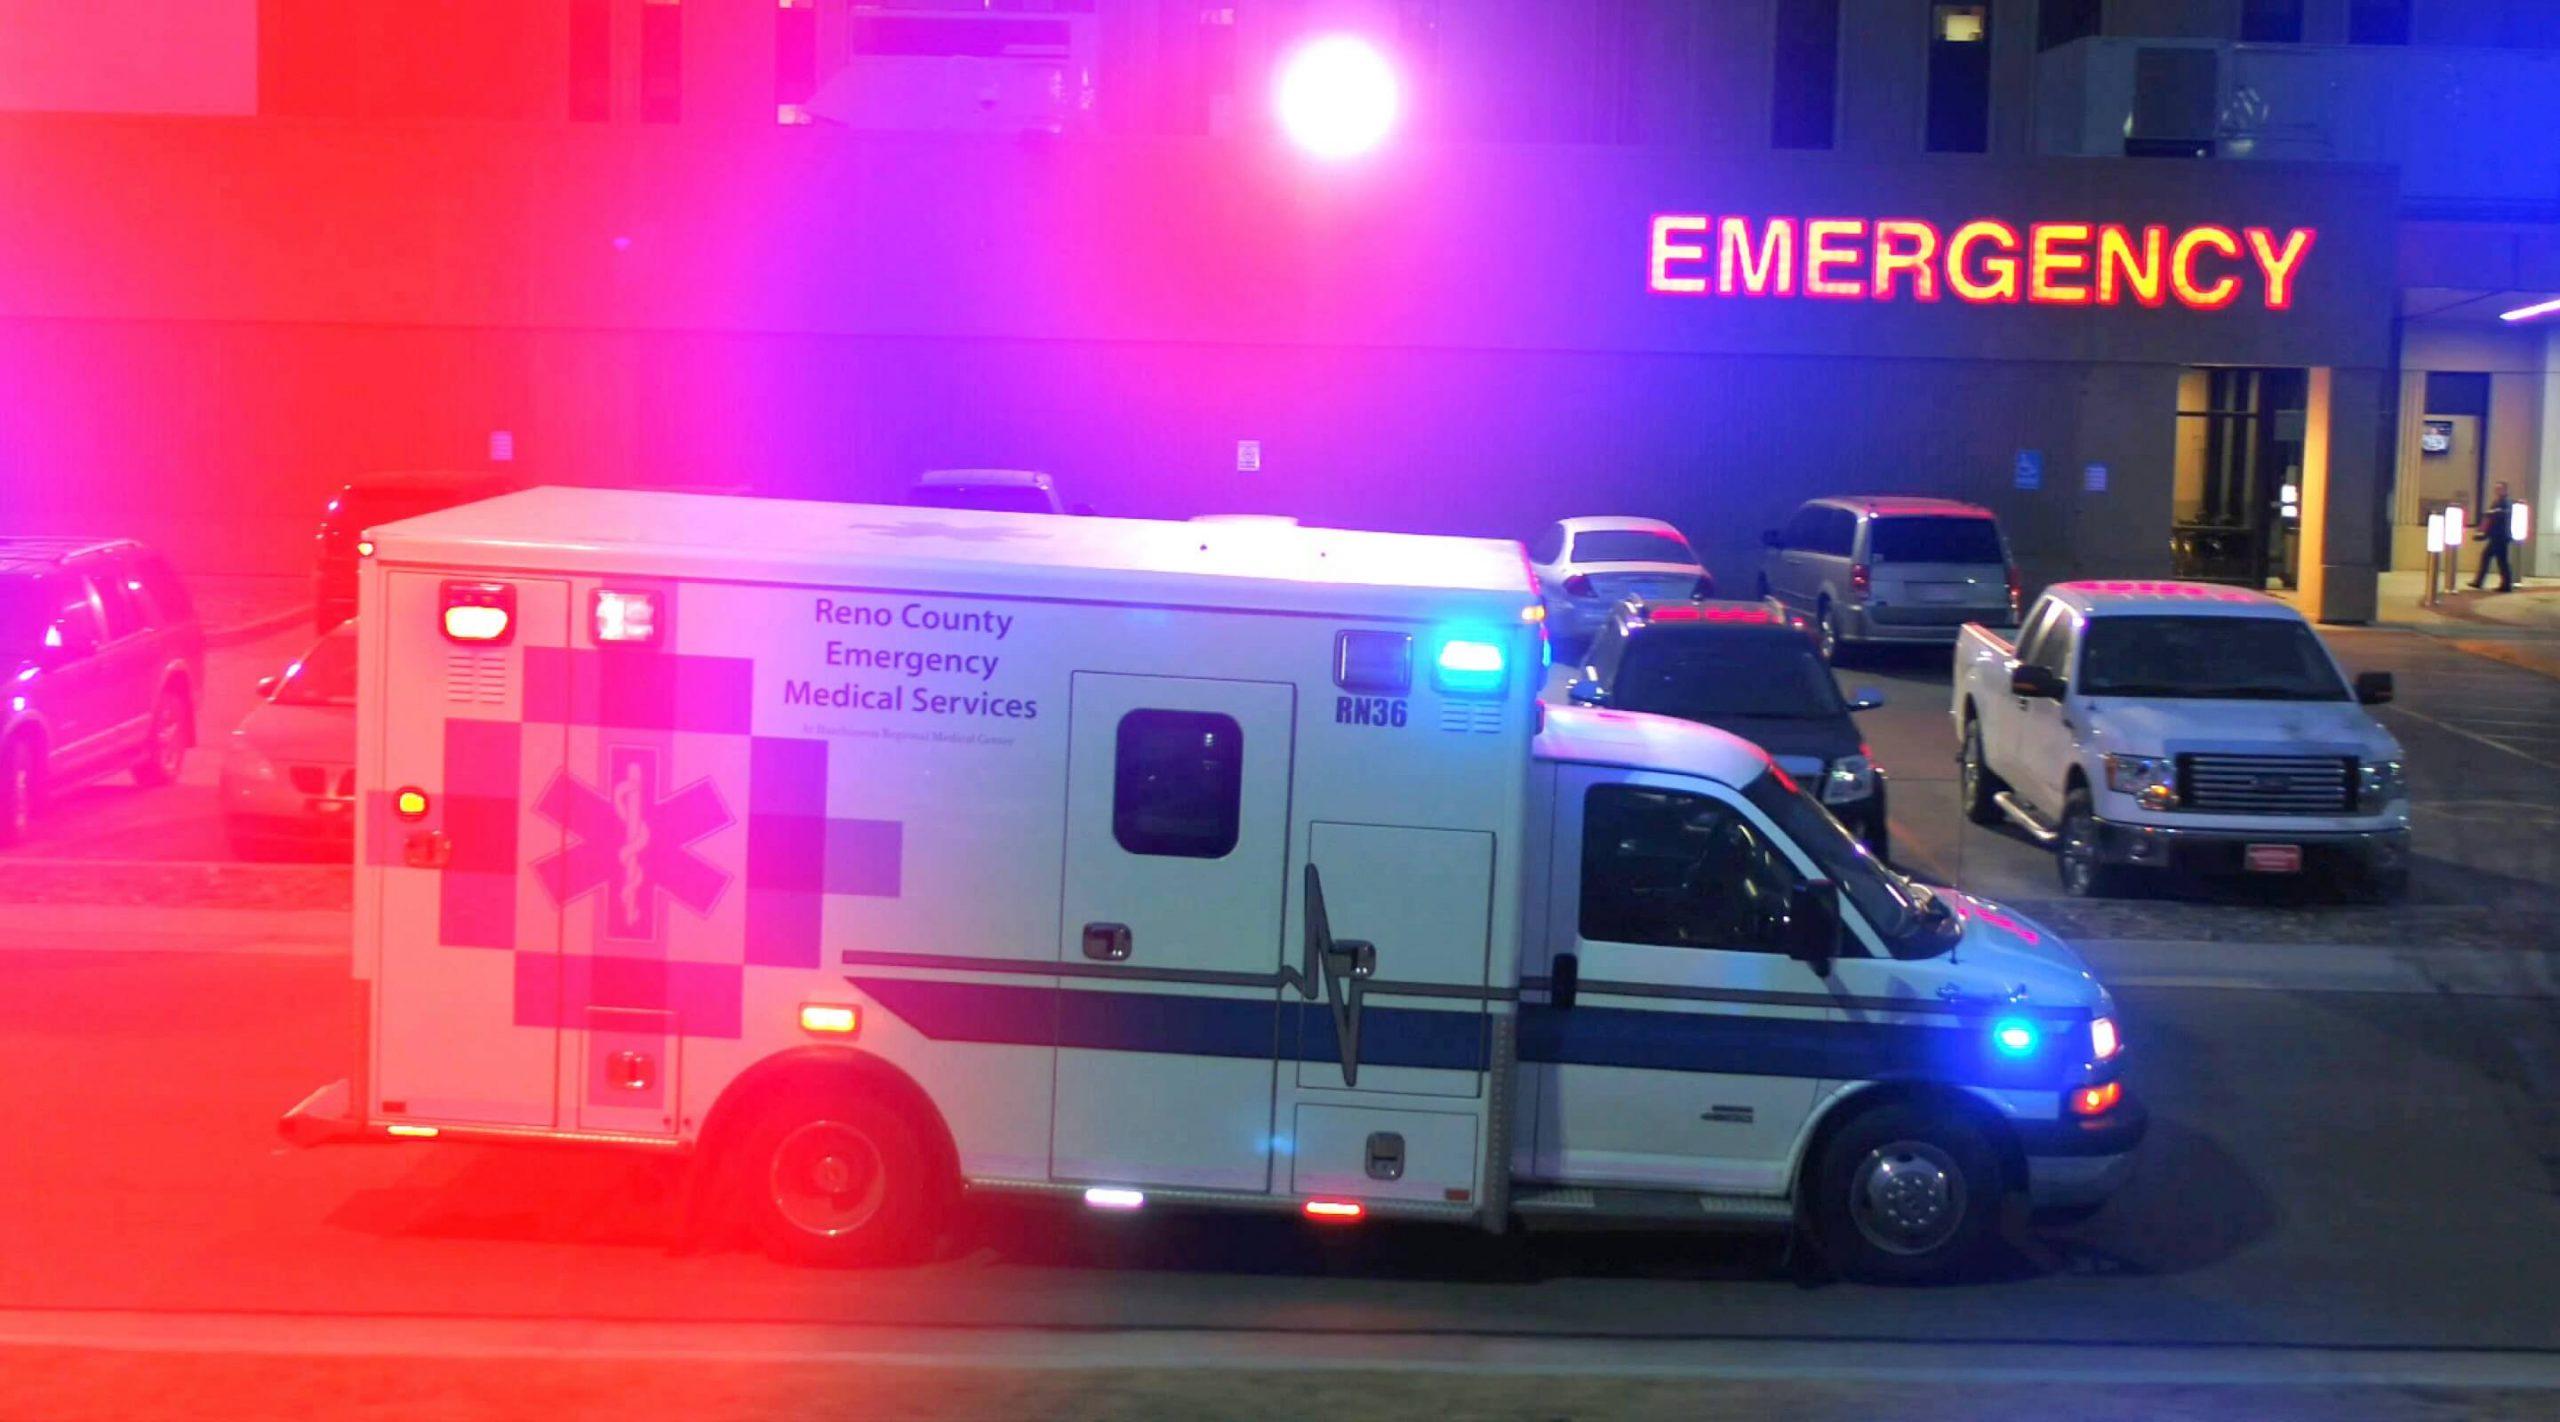 Reano County ambulance at Hutchinson Regional Medical Center